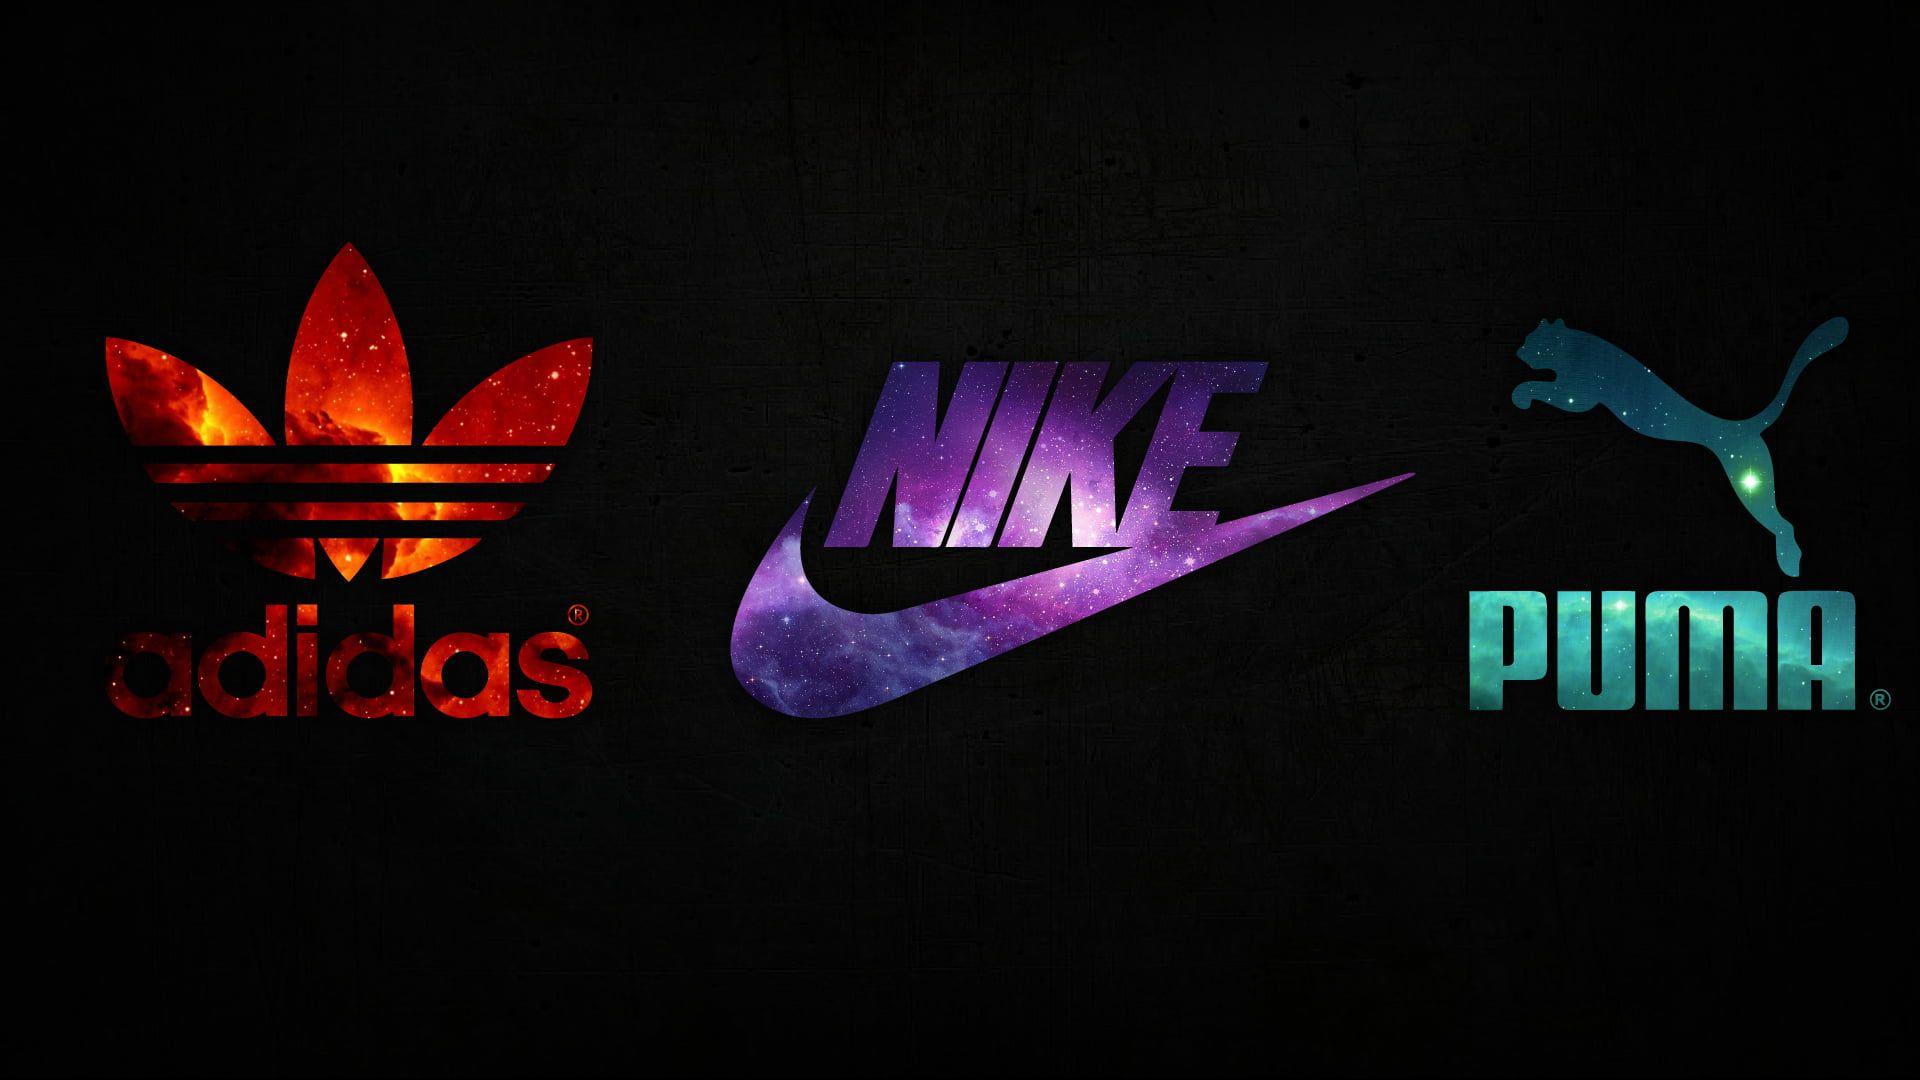 Nike #Adidas #Puma #space #logo #1080P #wallpaper #hdwallpaper ...